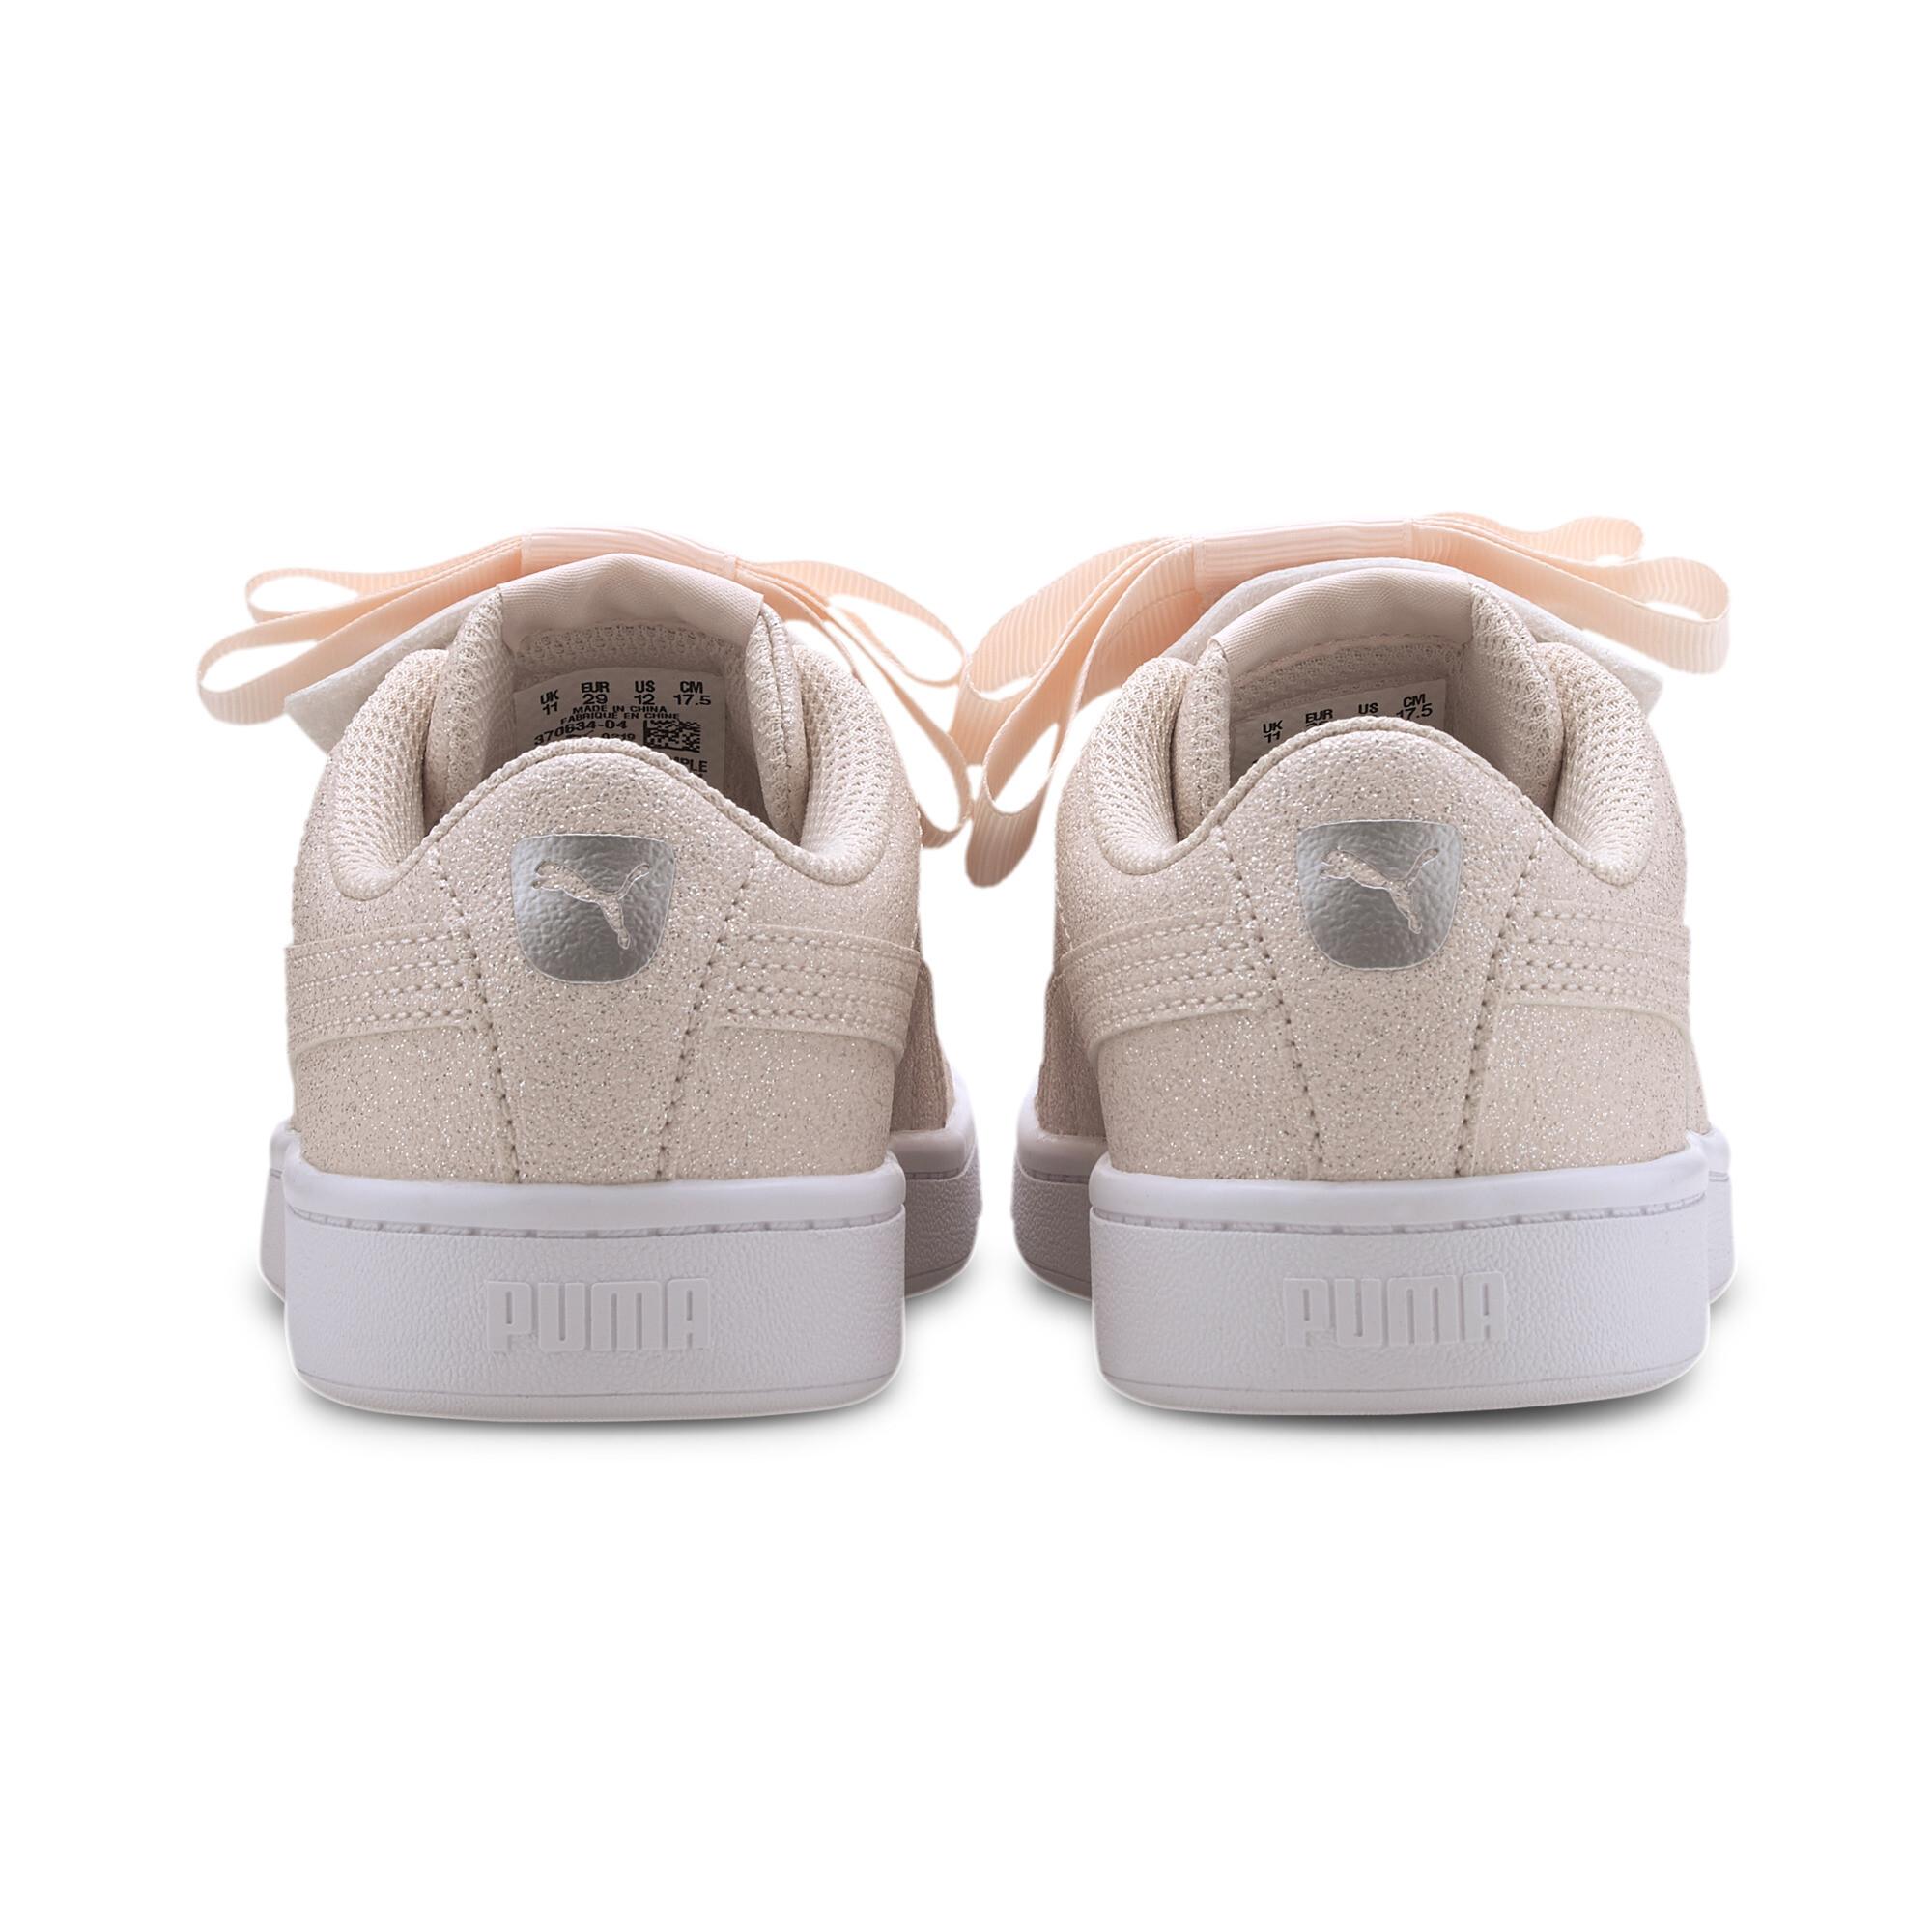 PUMA-Vikky-v2-Ribbon-Glitz-Little-Kids-039-Shoes-Girls-Shoe-Kids thumbnail 3